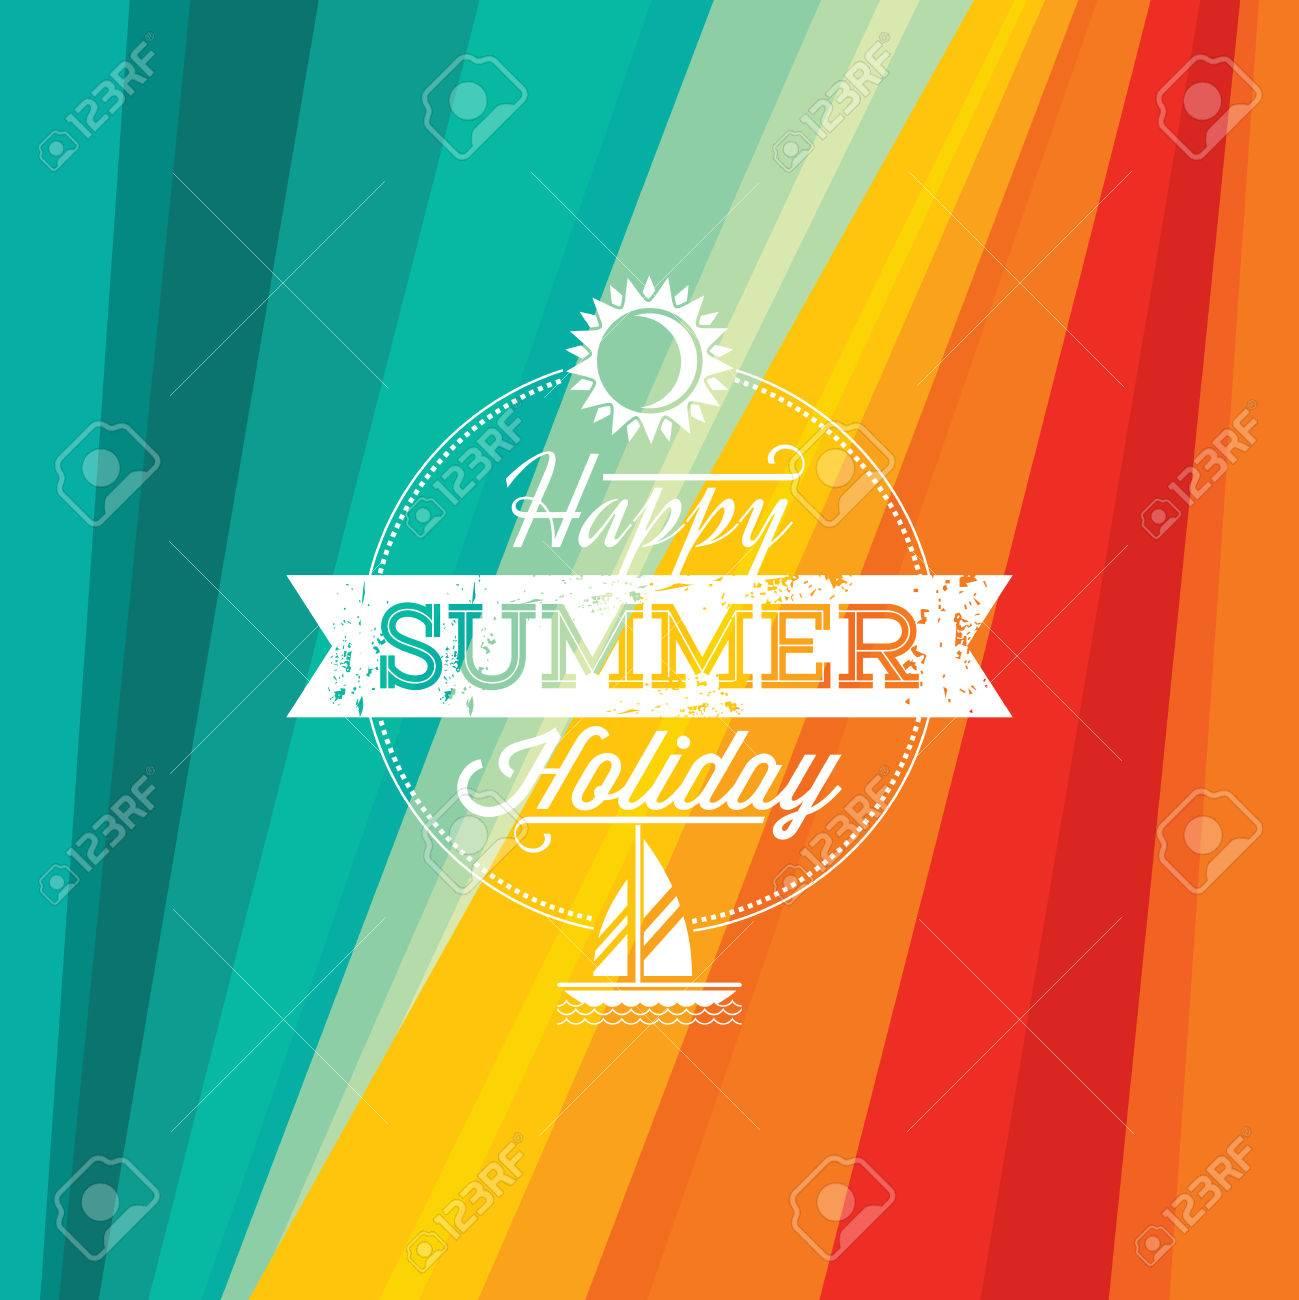 Summer holidays illustration  summer background Standard-Bild - 39943092